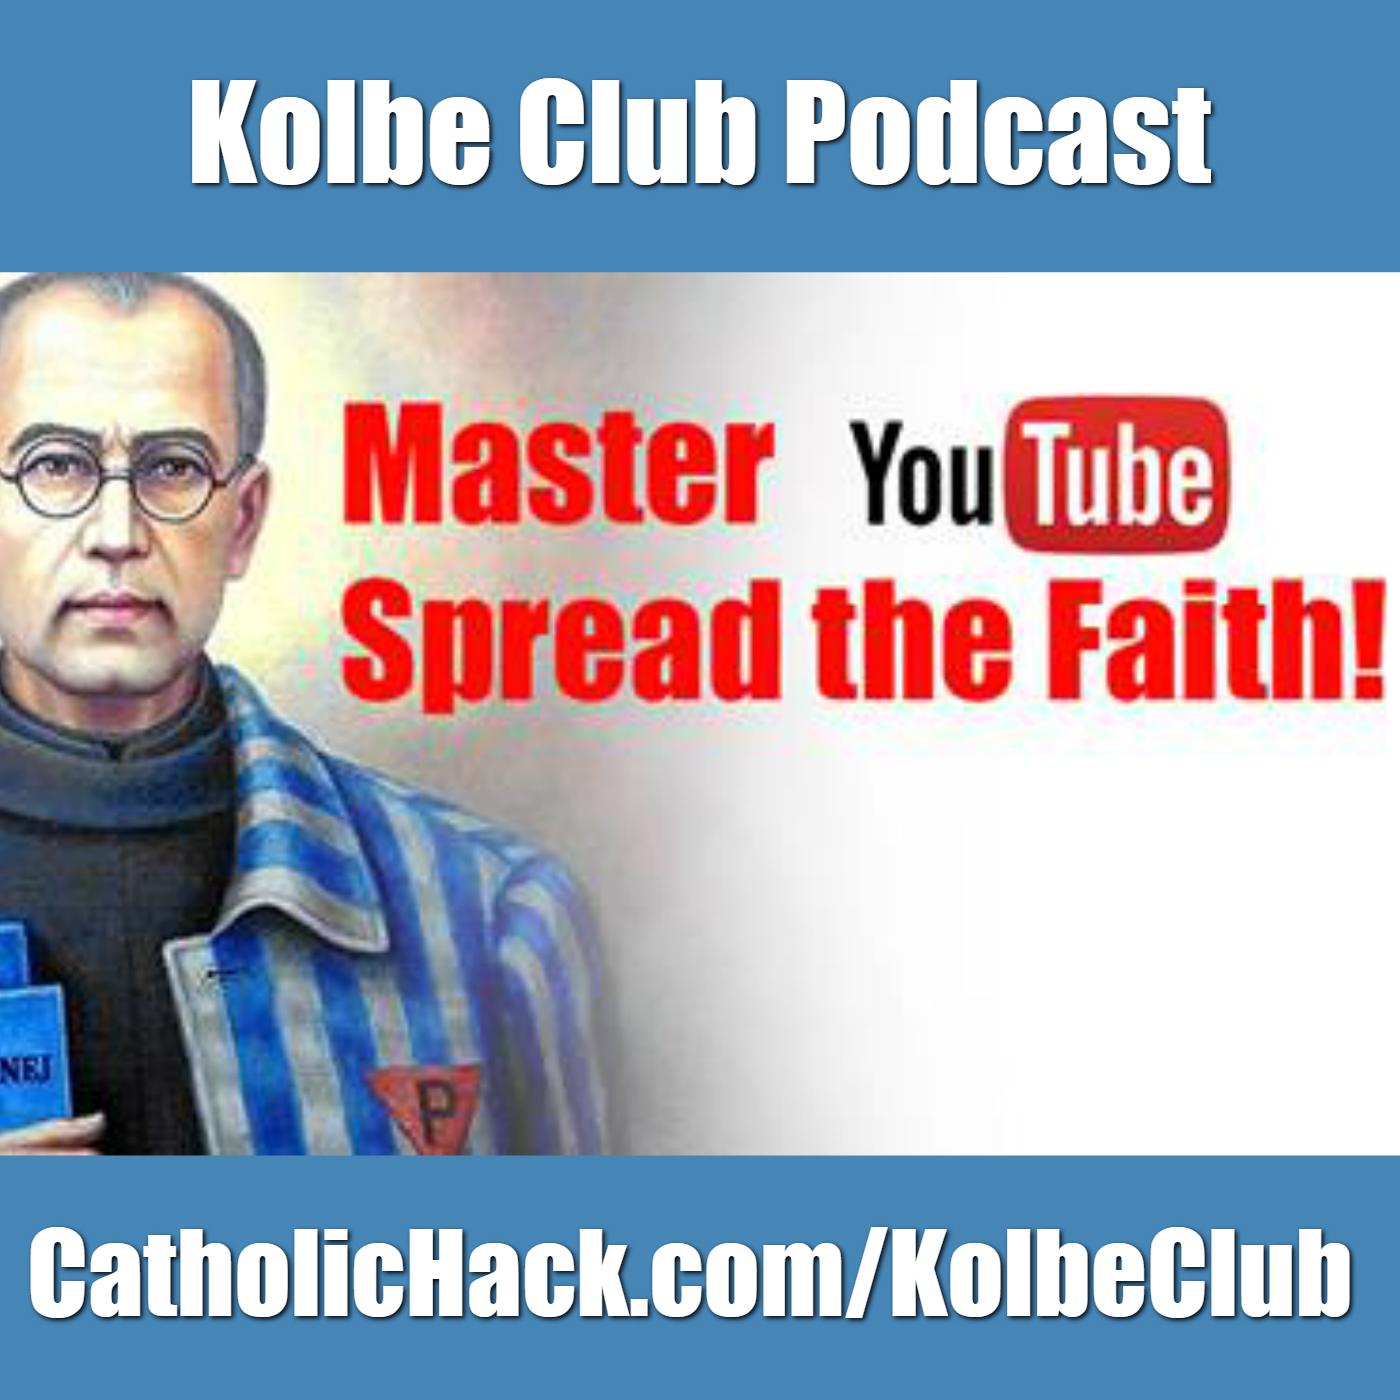 The Kolbe Club